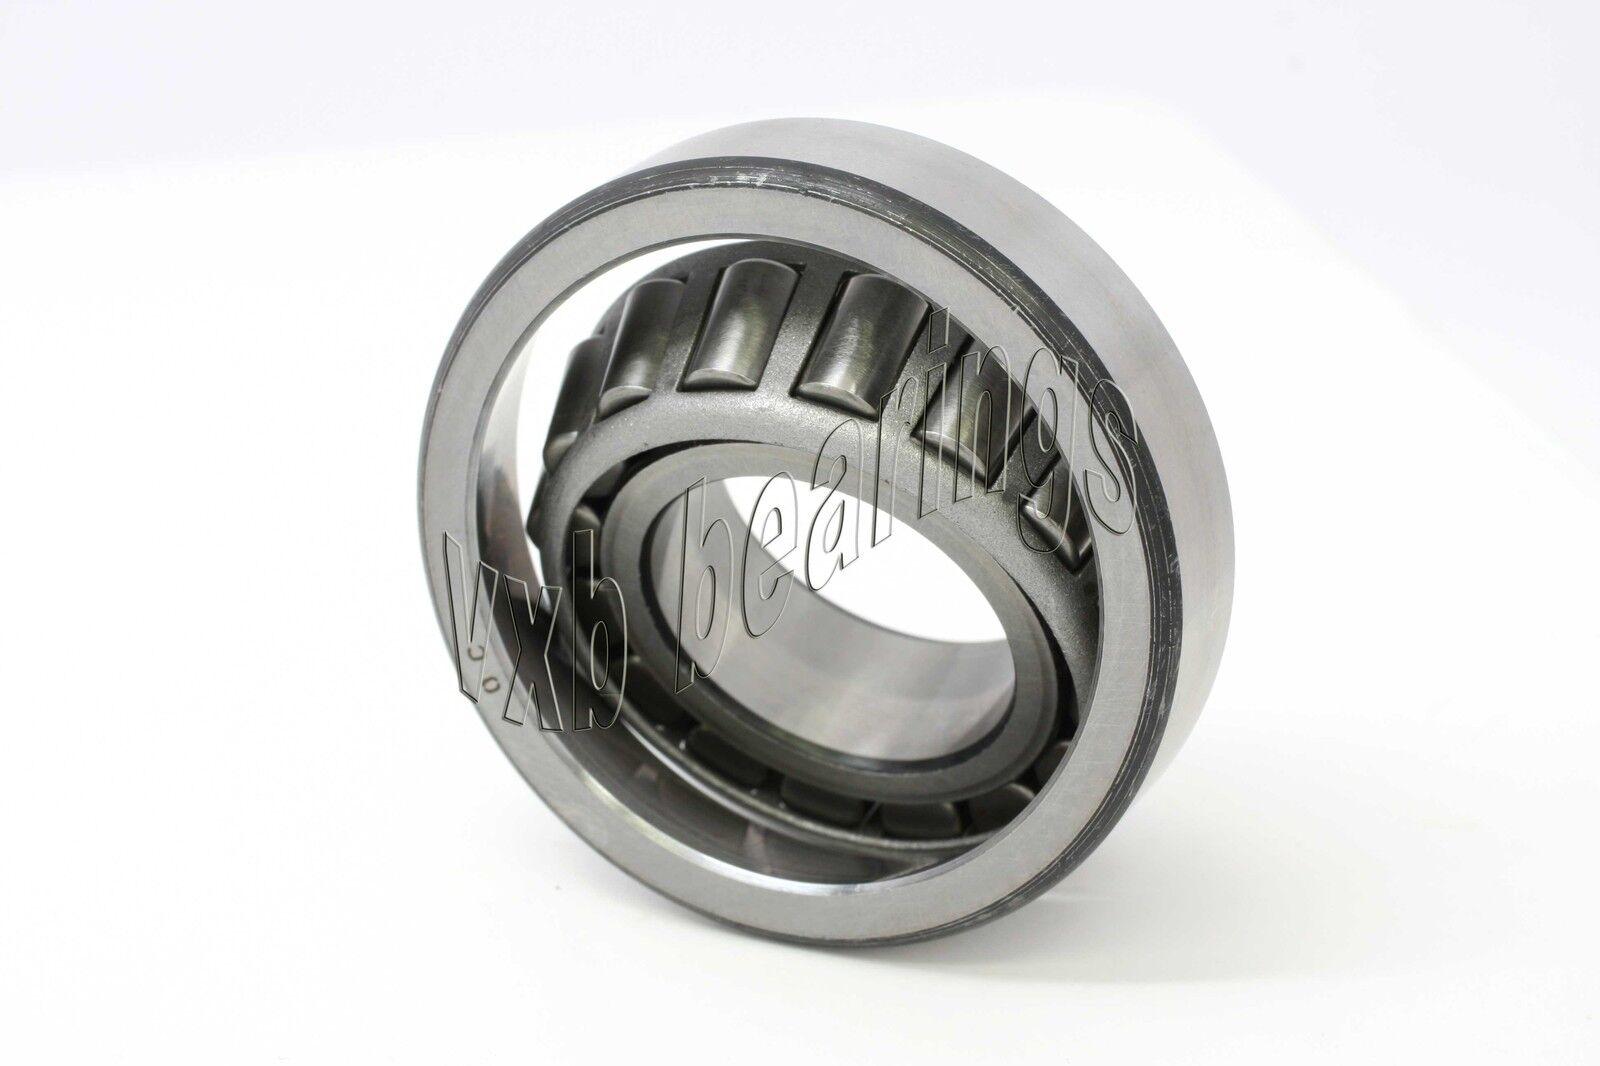 30203 Metric Tapered Roller Bearing Set 17mmx40mmx13.25mm